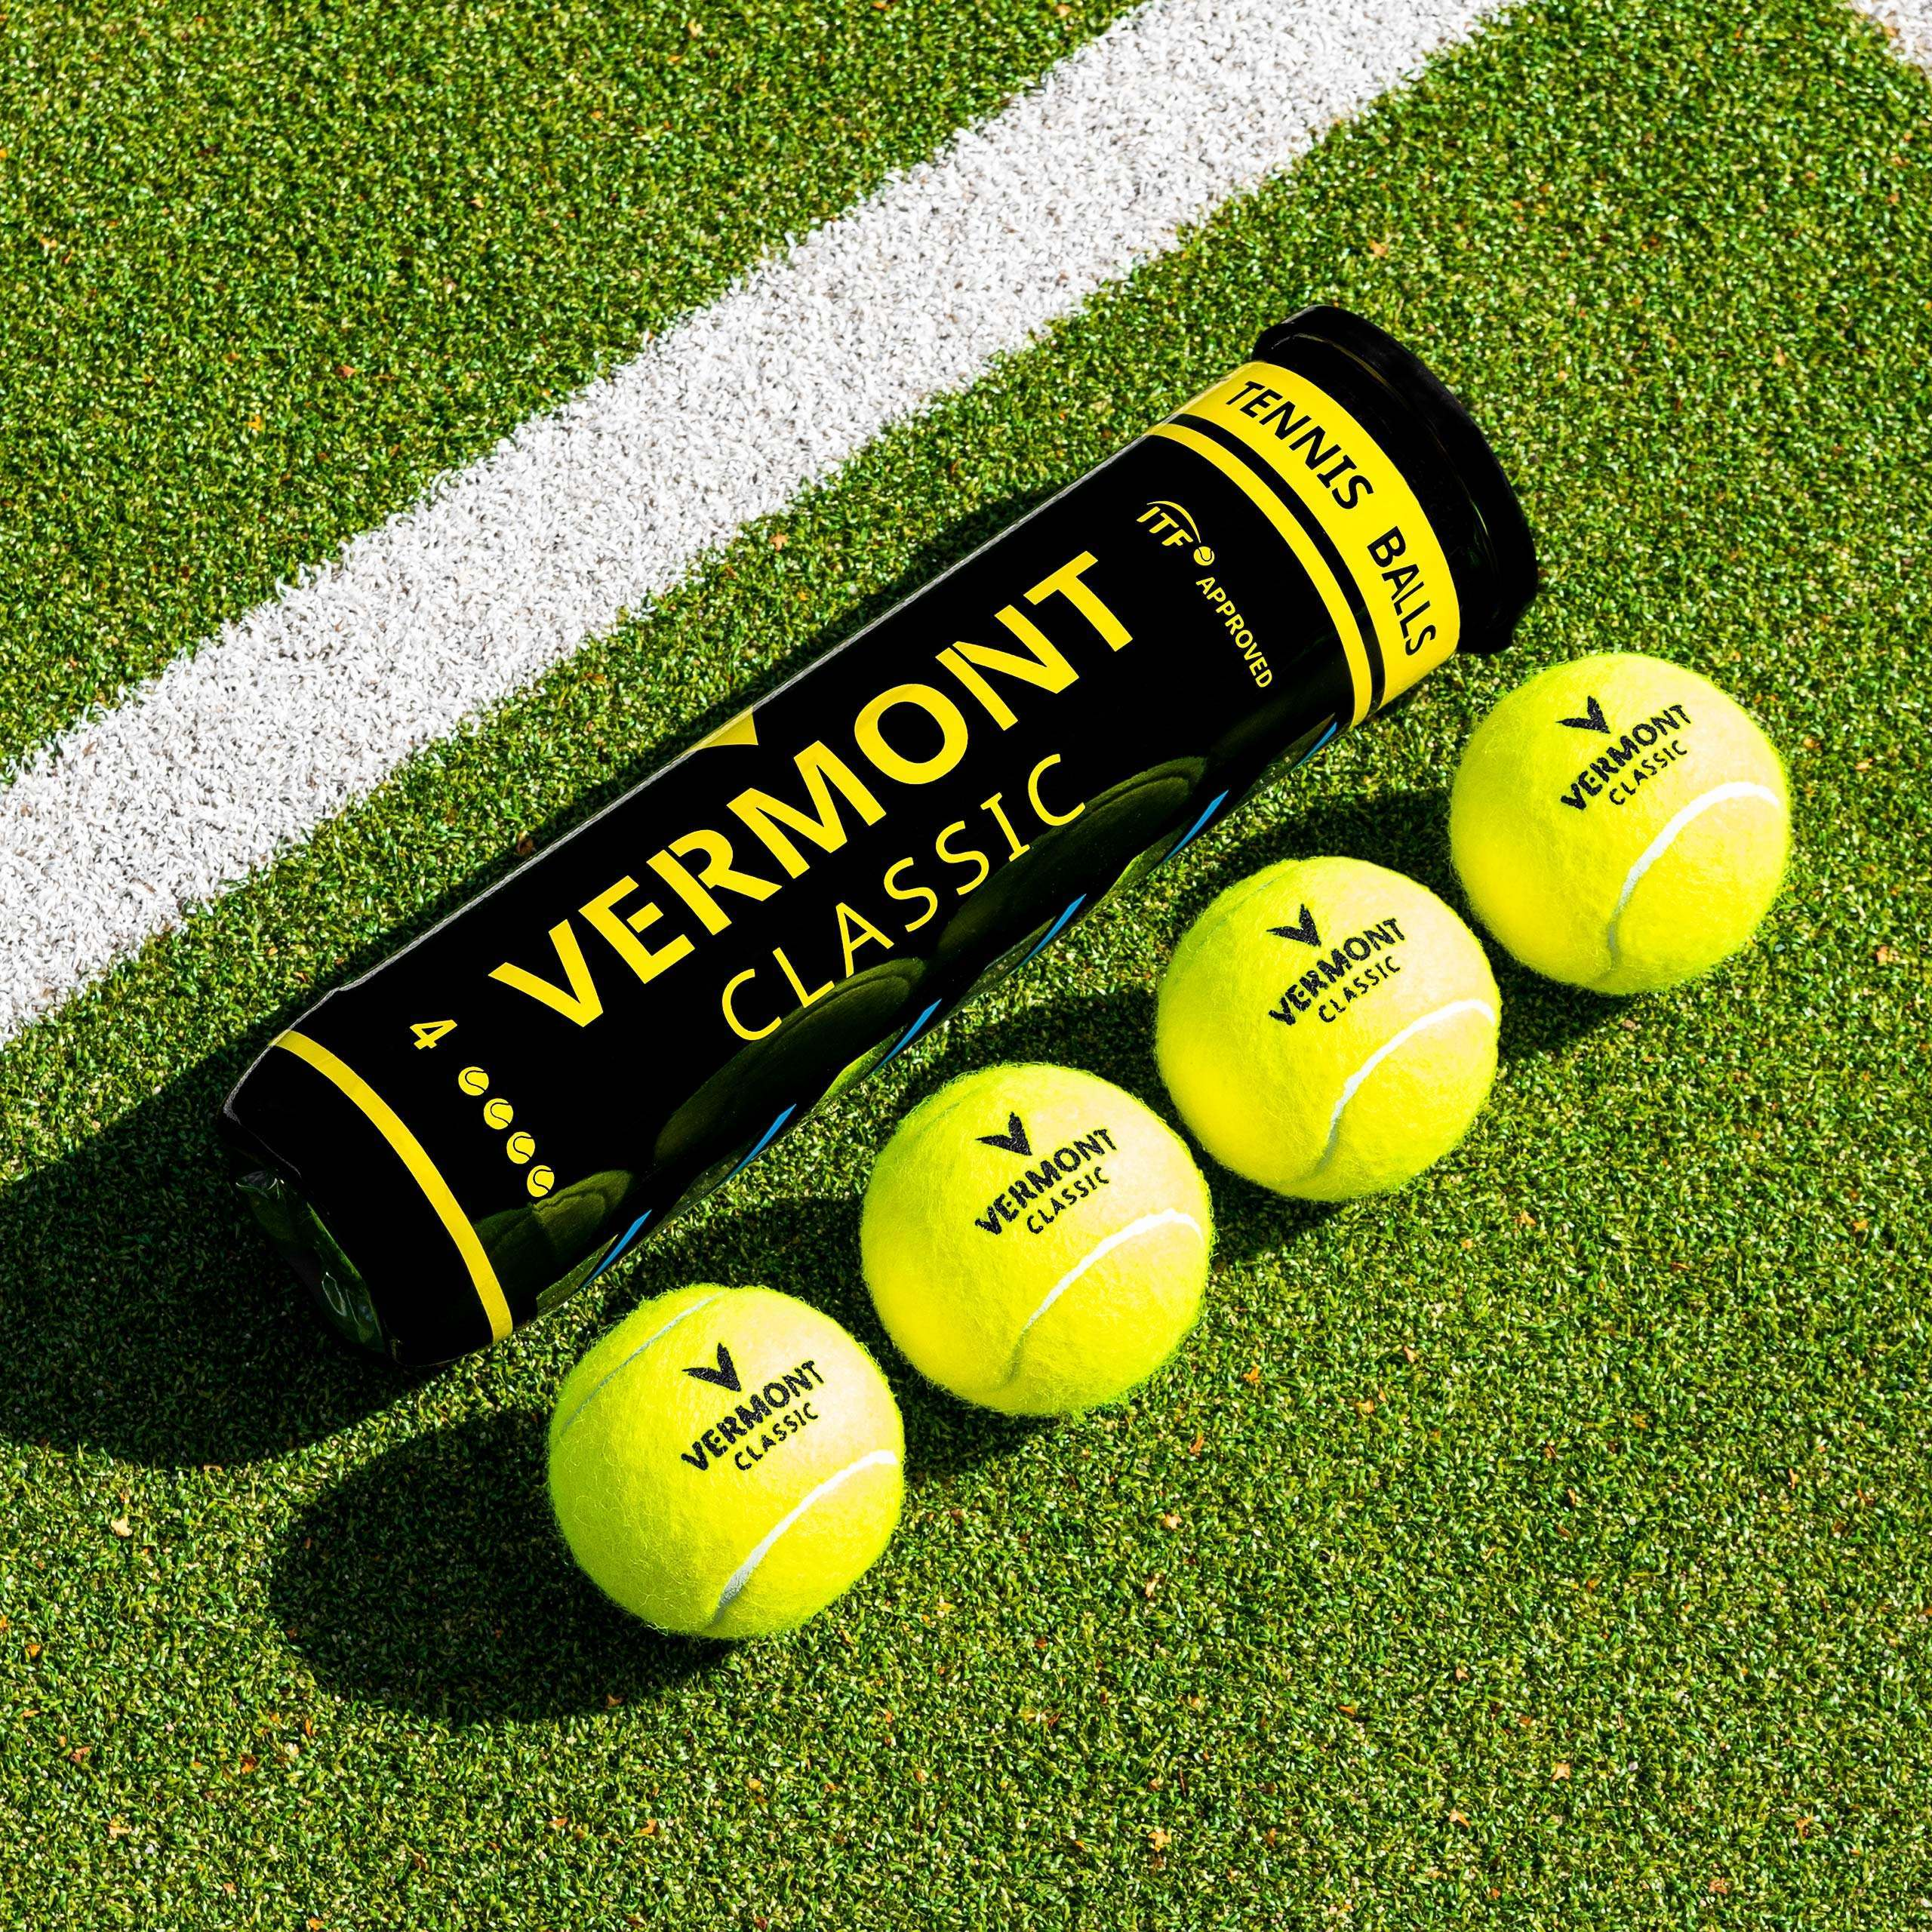 Vermont Classic Tennis Balls [4 Ball Tubes]